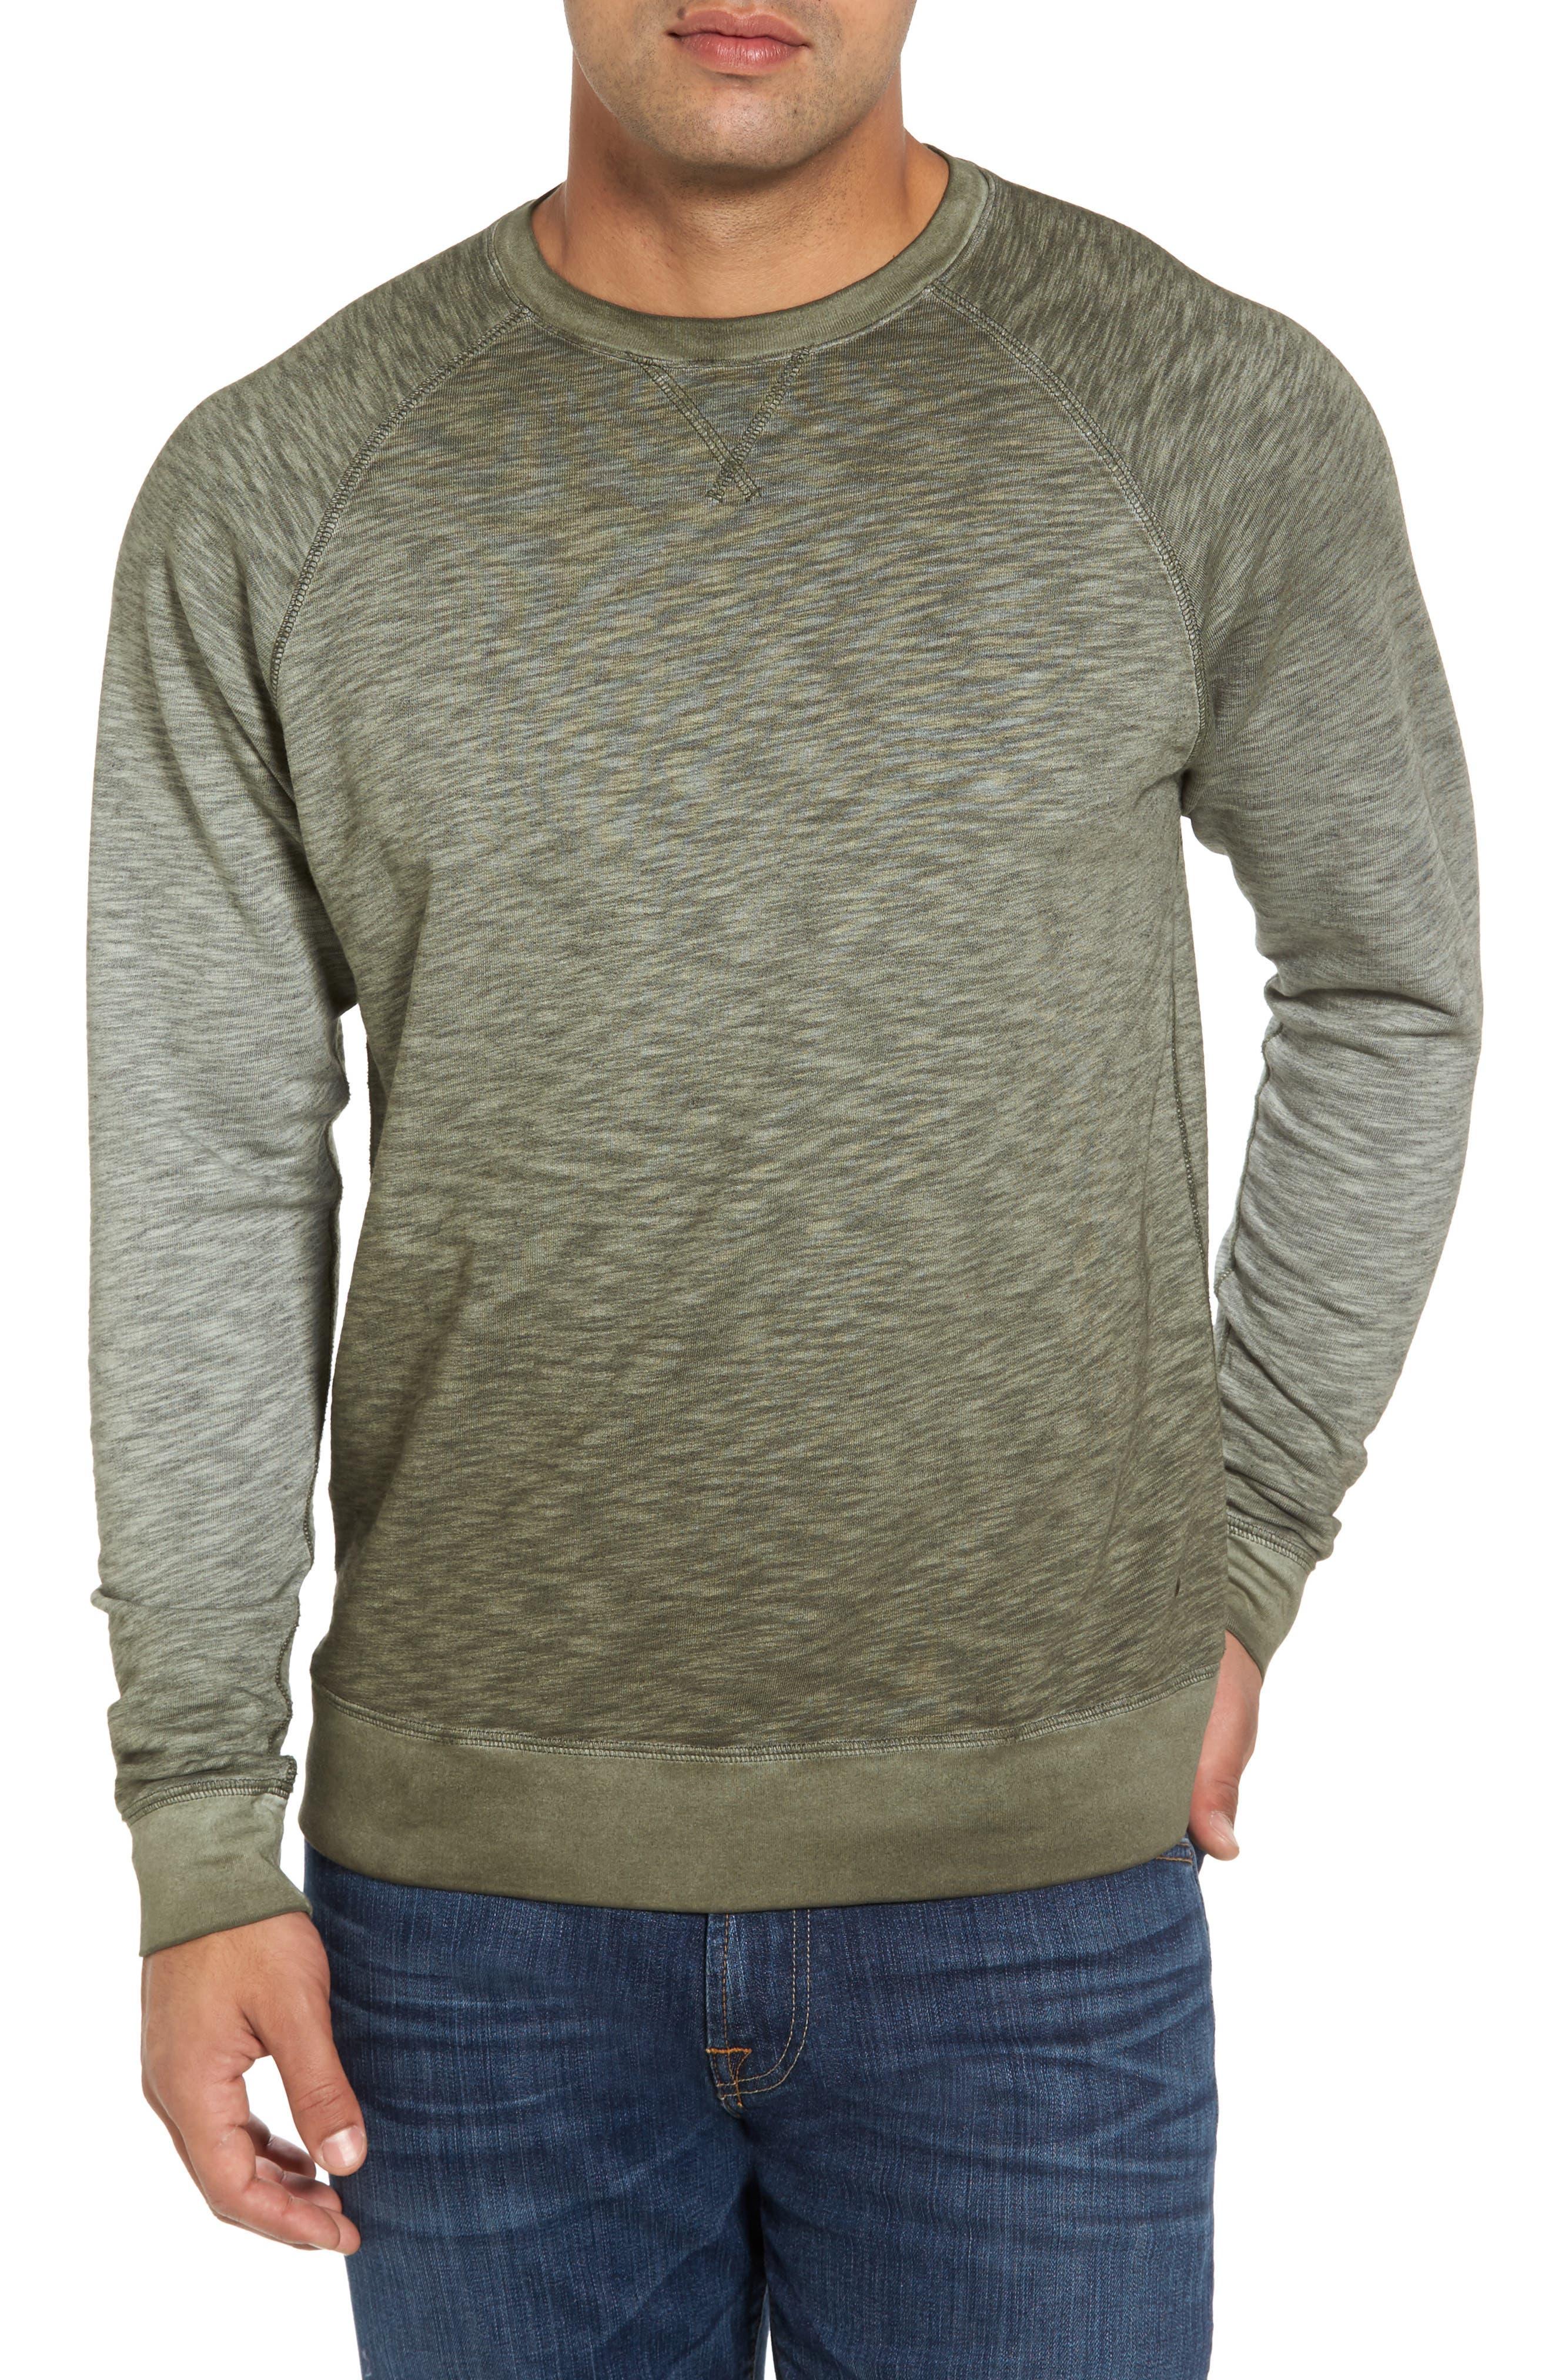 Tommy Bahama 'Santiago' Ombré Crewneck Sweatshirt